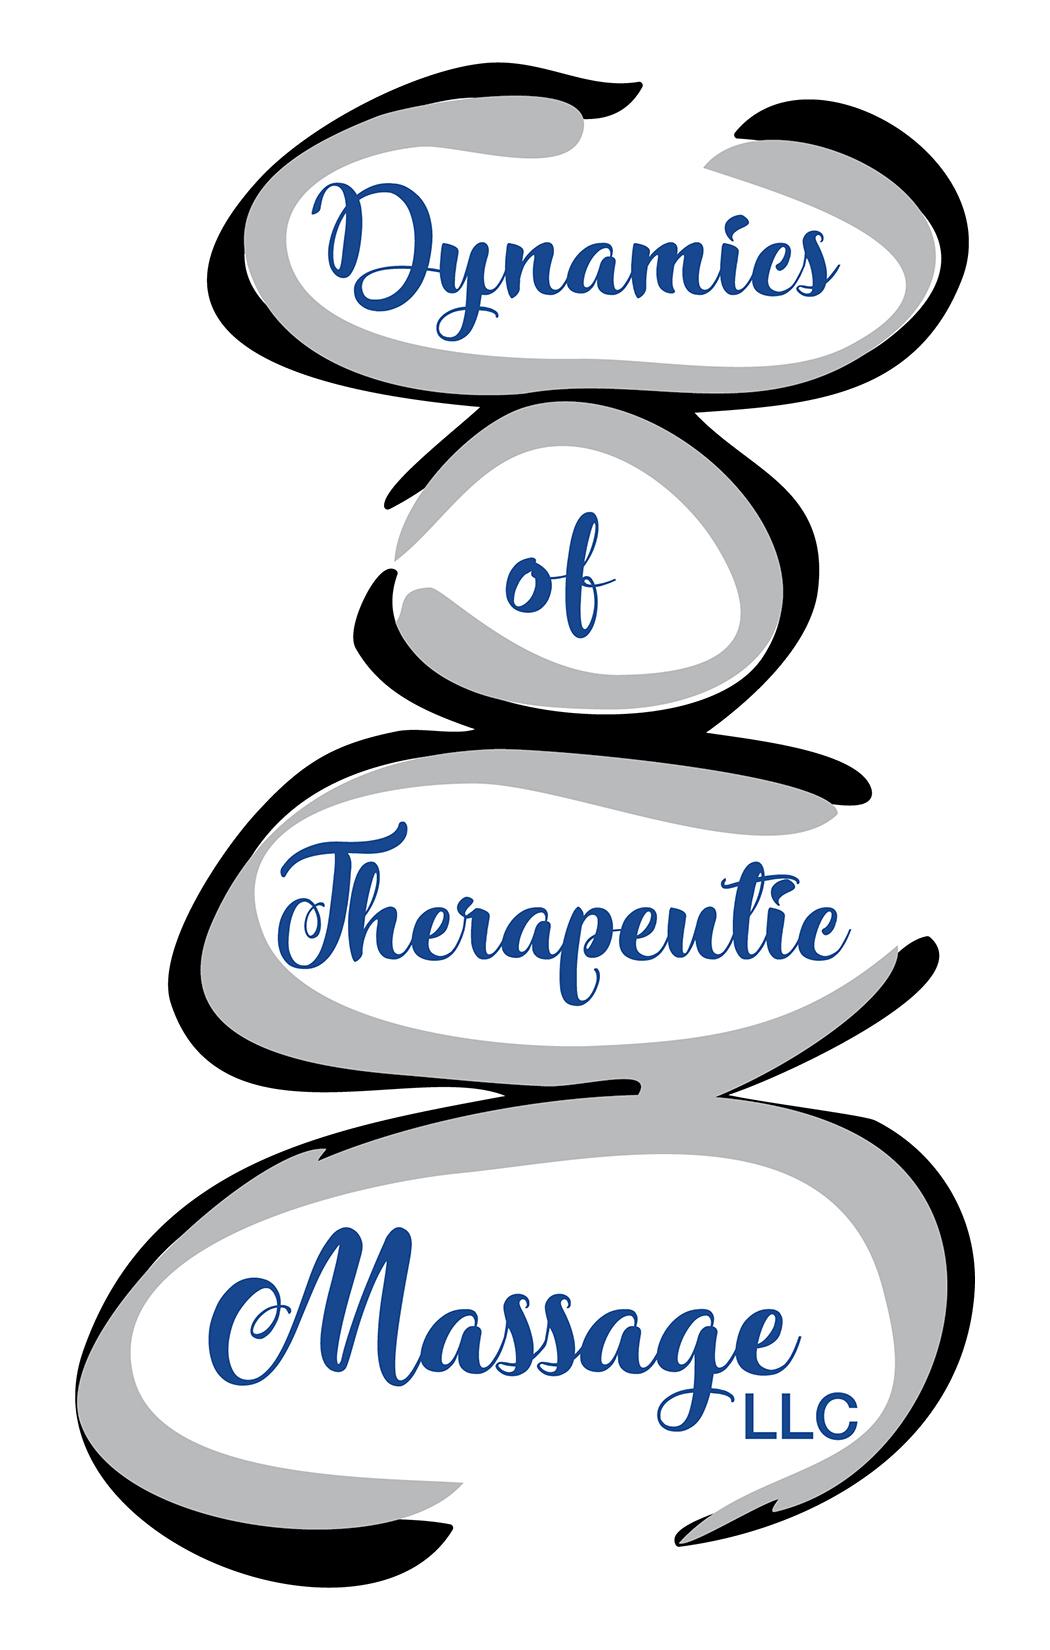 Sponsor Dynamics of Therapeutic Massage